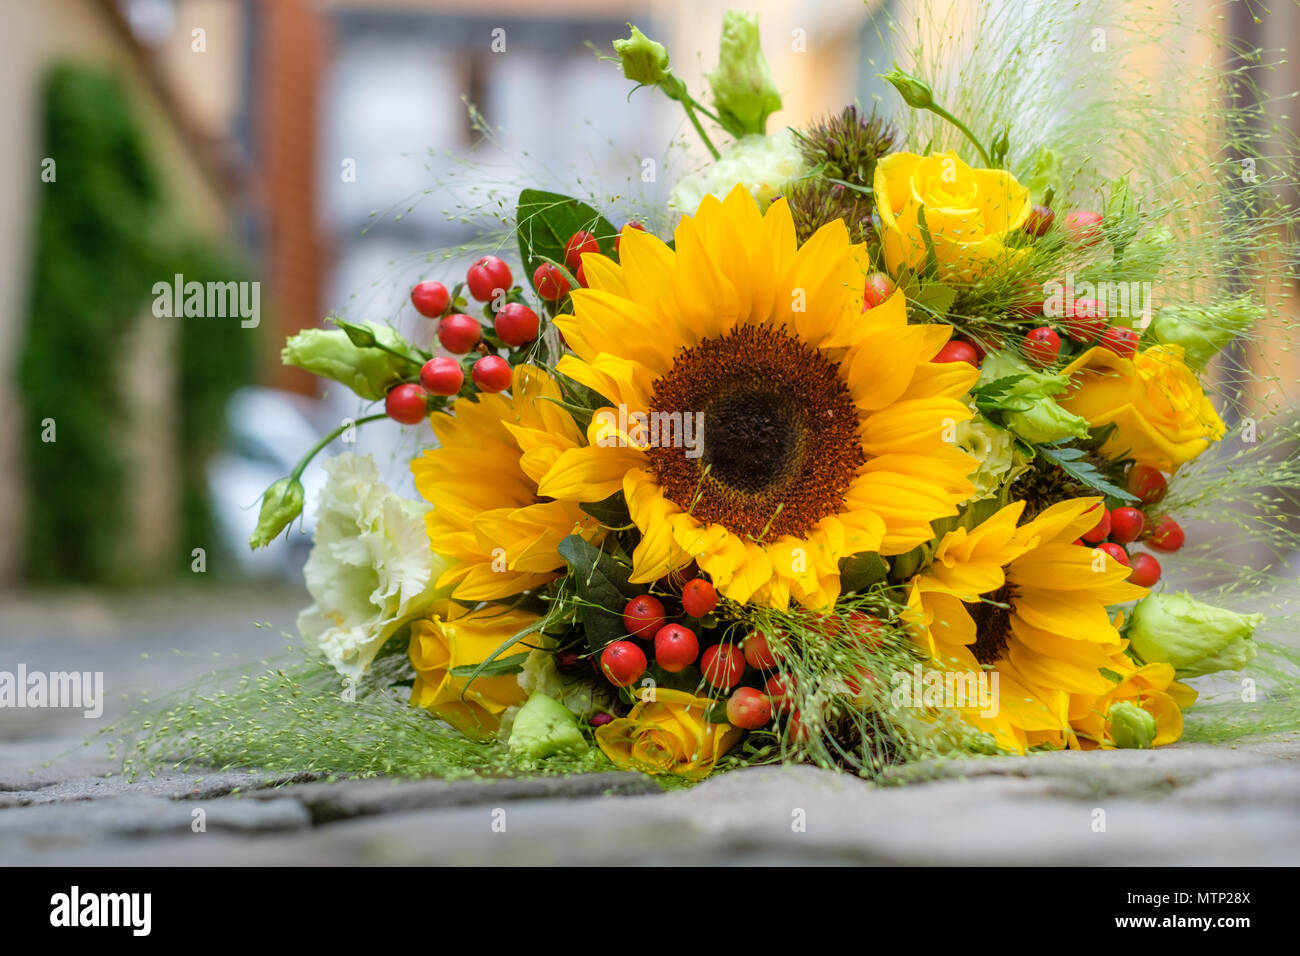 Brautstrauss Sommerblumen Brautstrauß - Stock Image